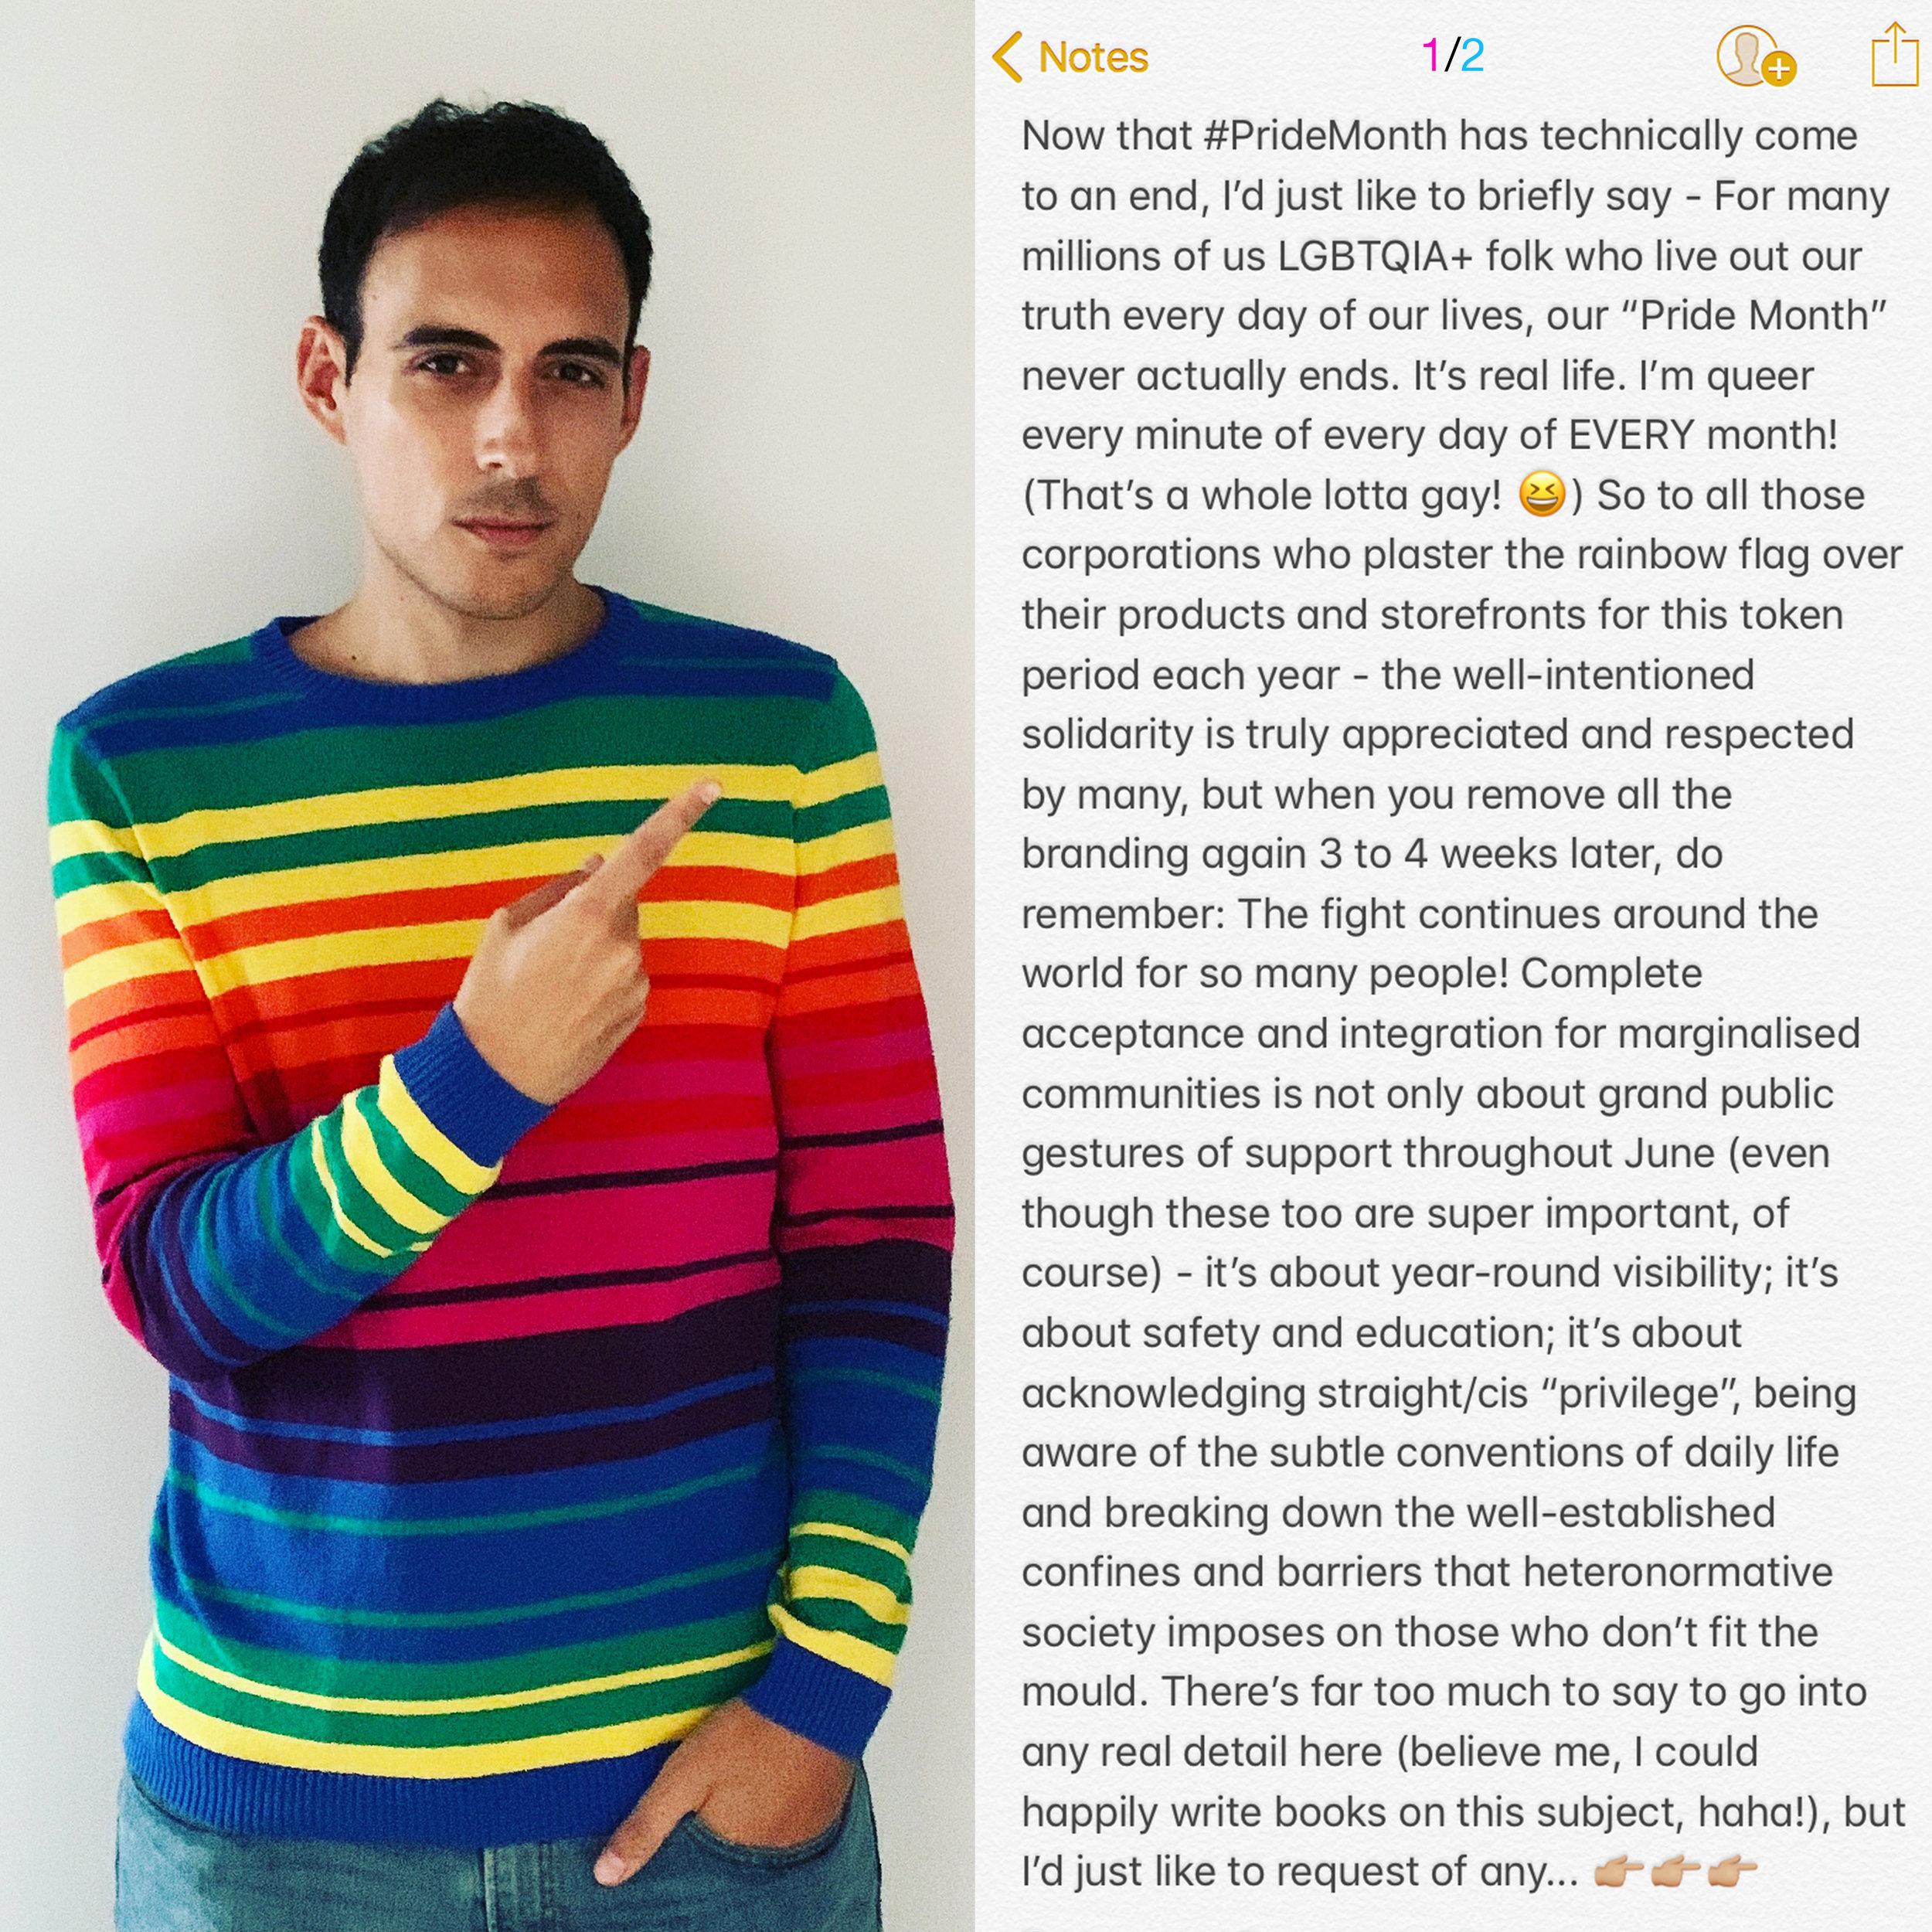 Matt Fishel_Pride Month 2019_1 of 2.jpg